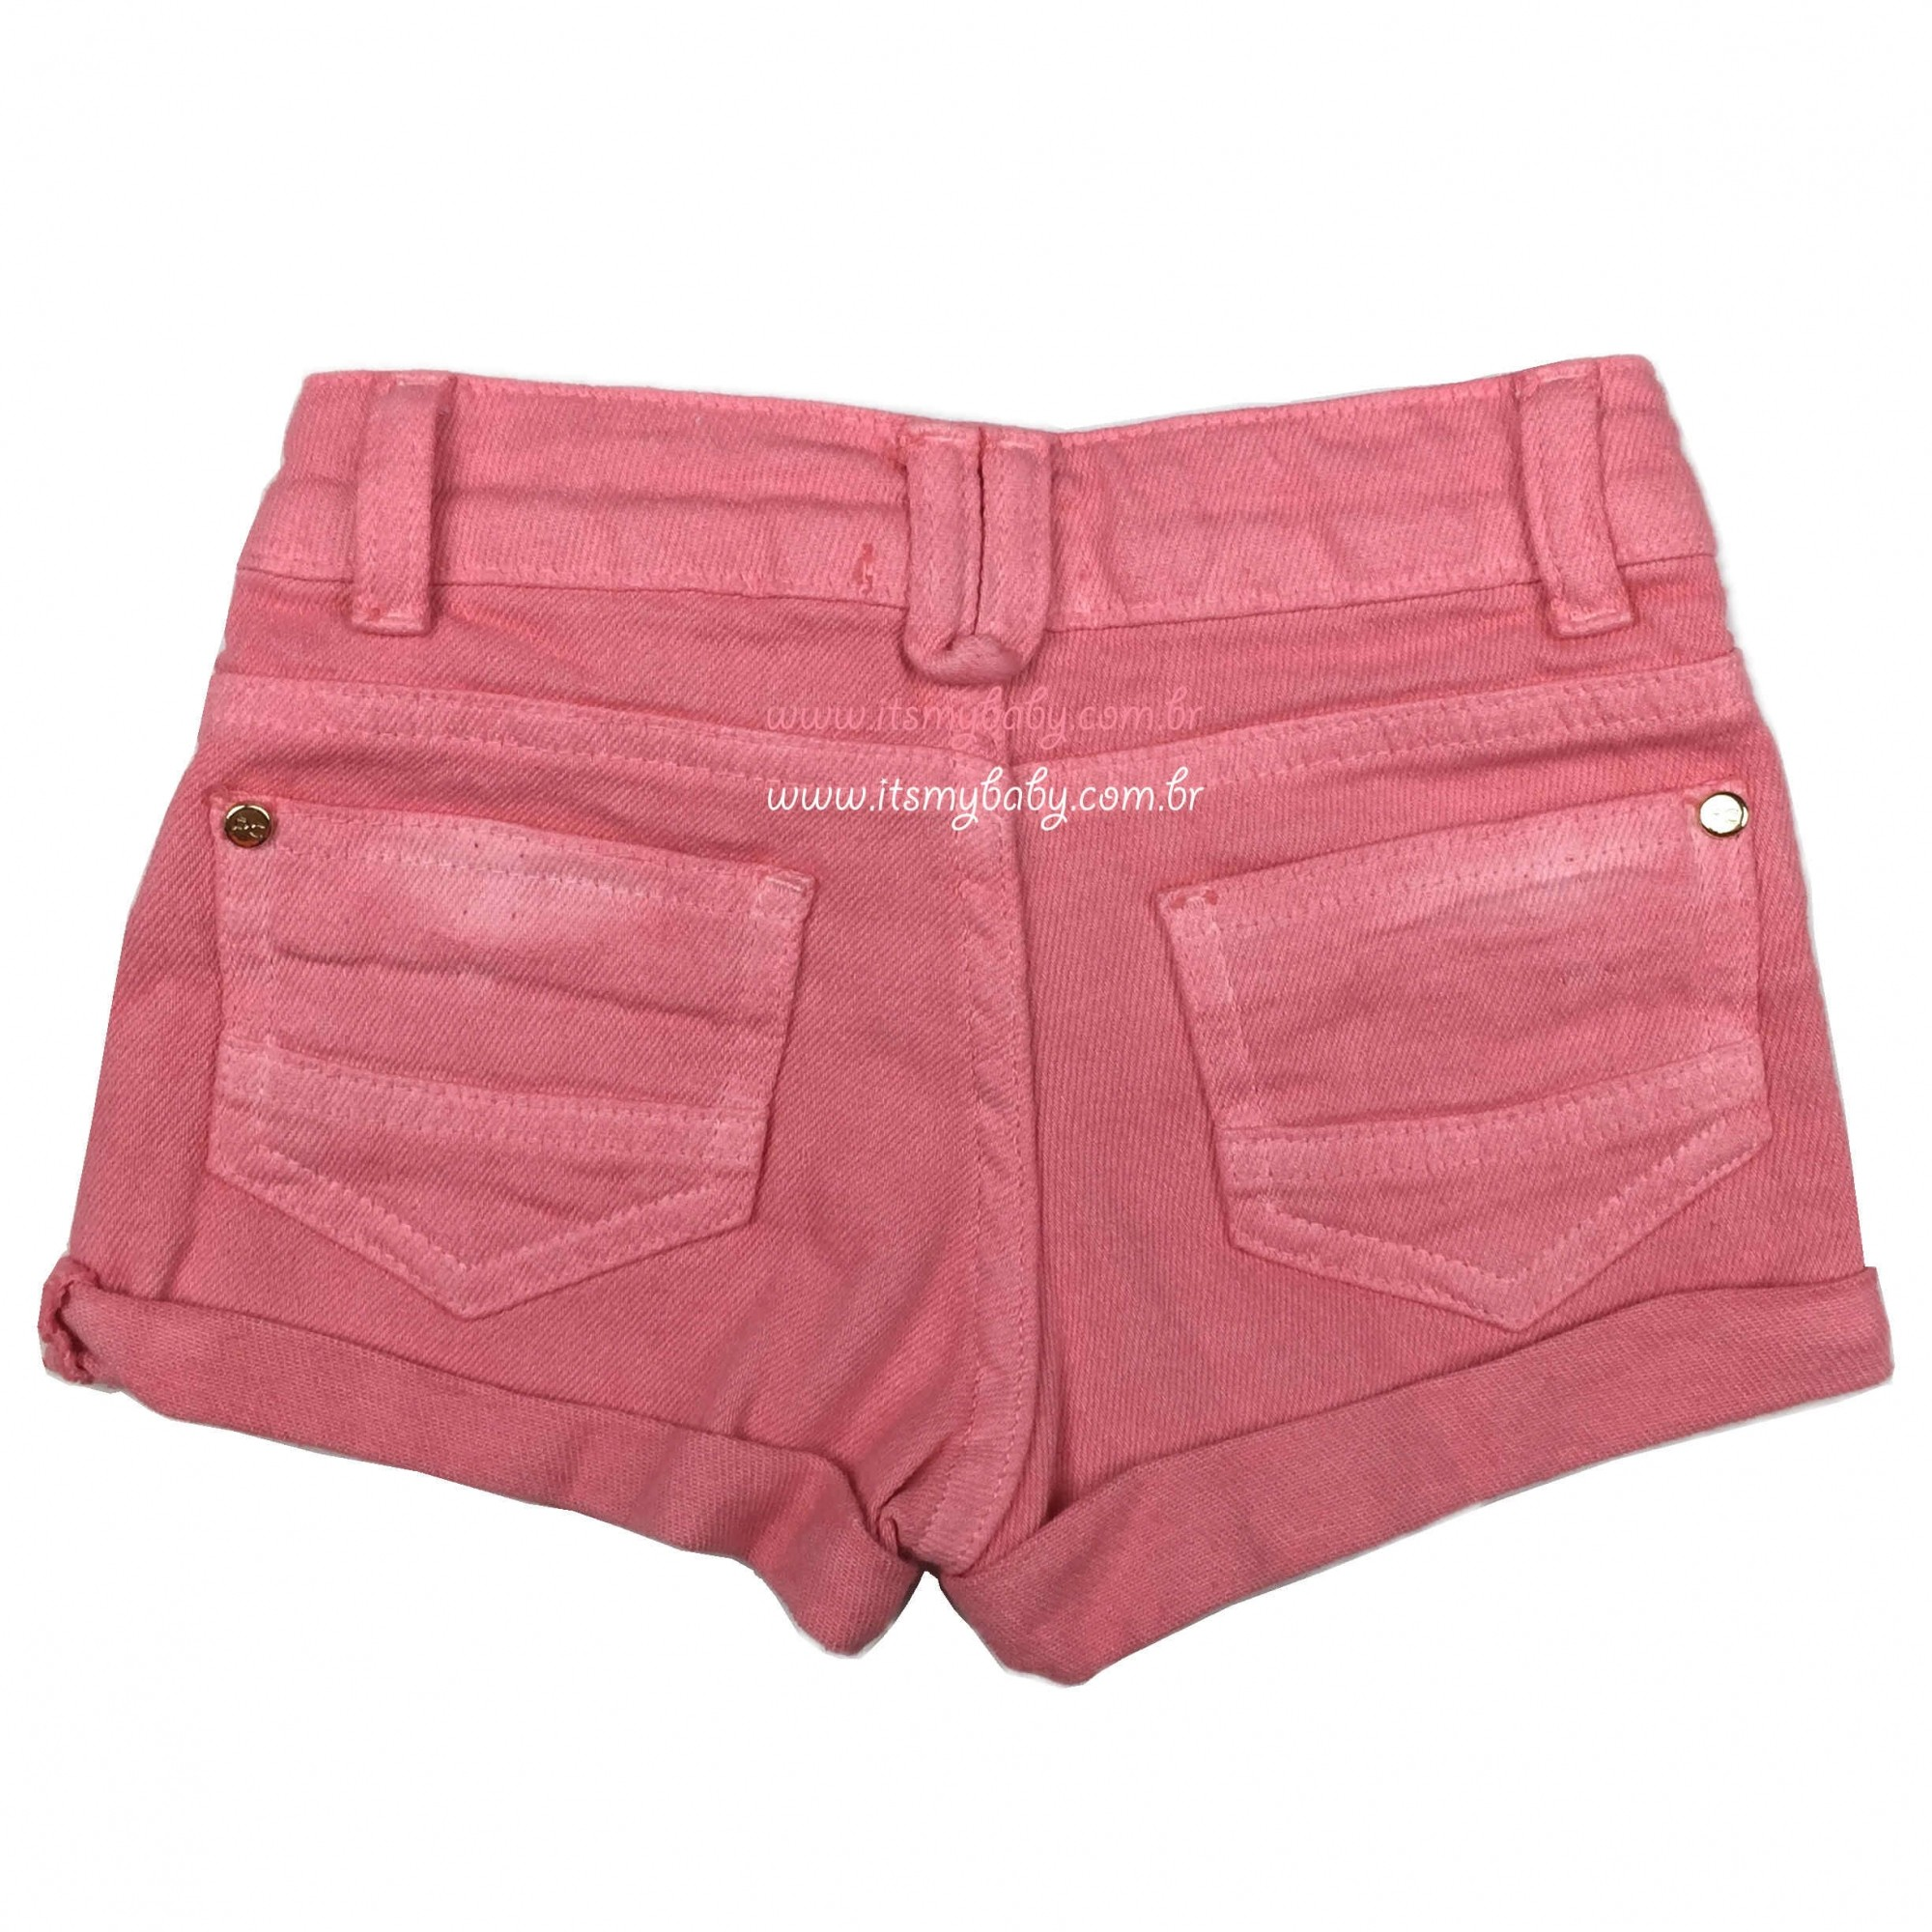 Conjunto Blusa e Shorts Rosa Petit Cherie